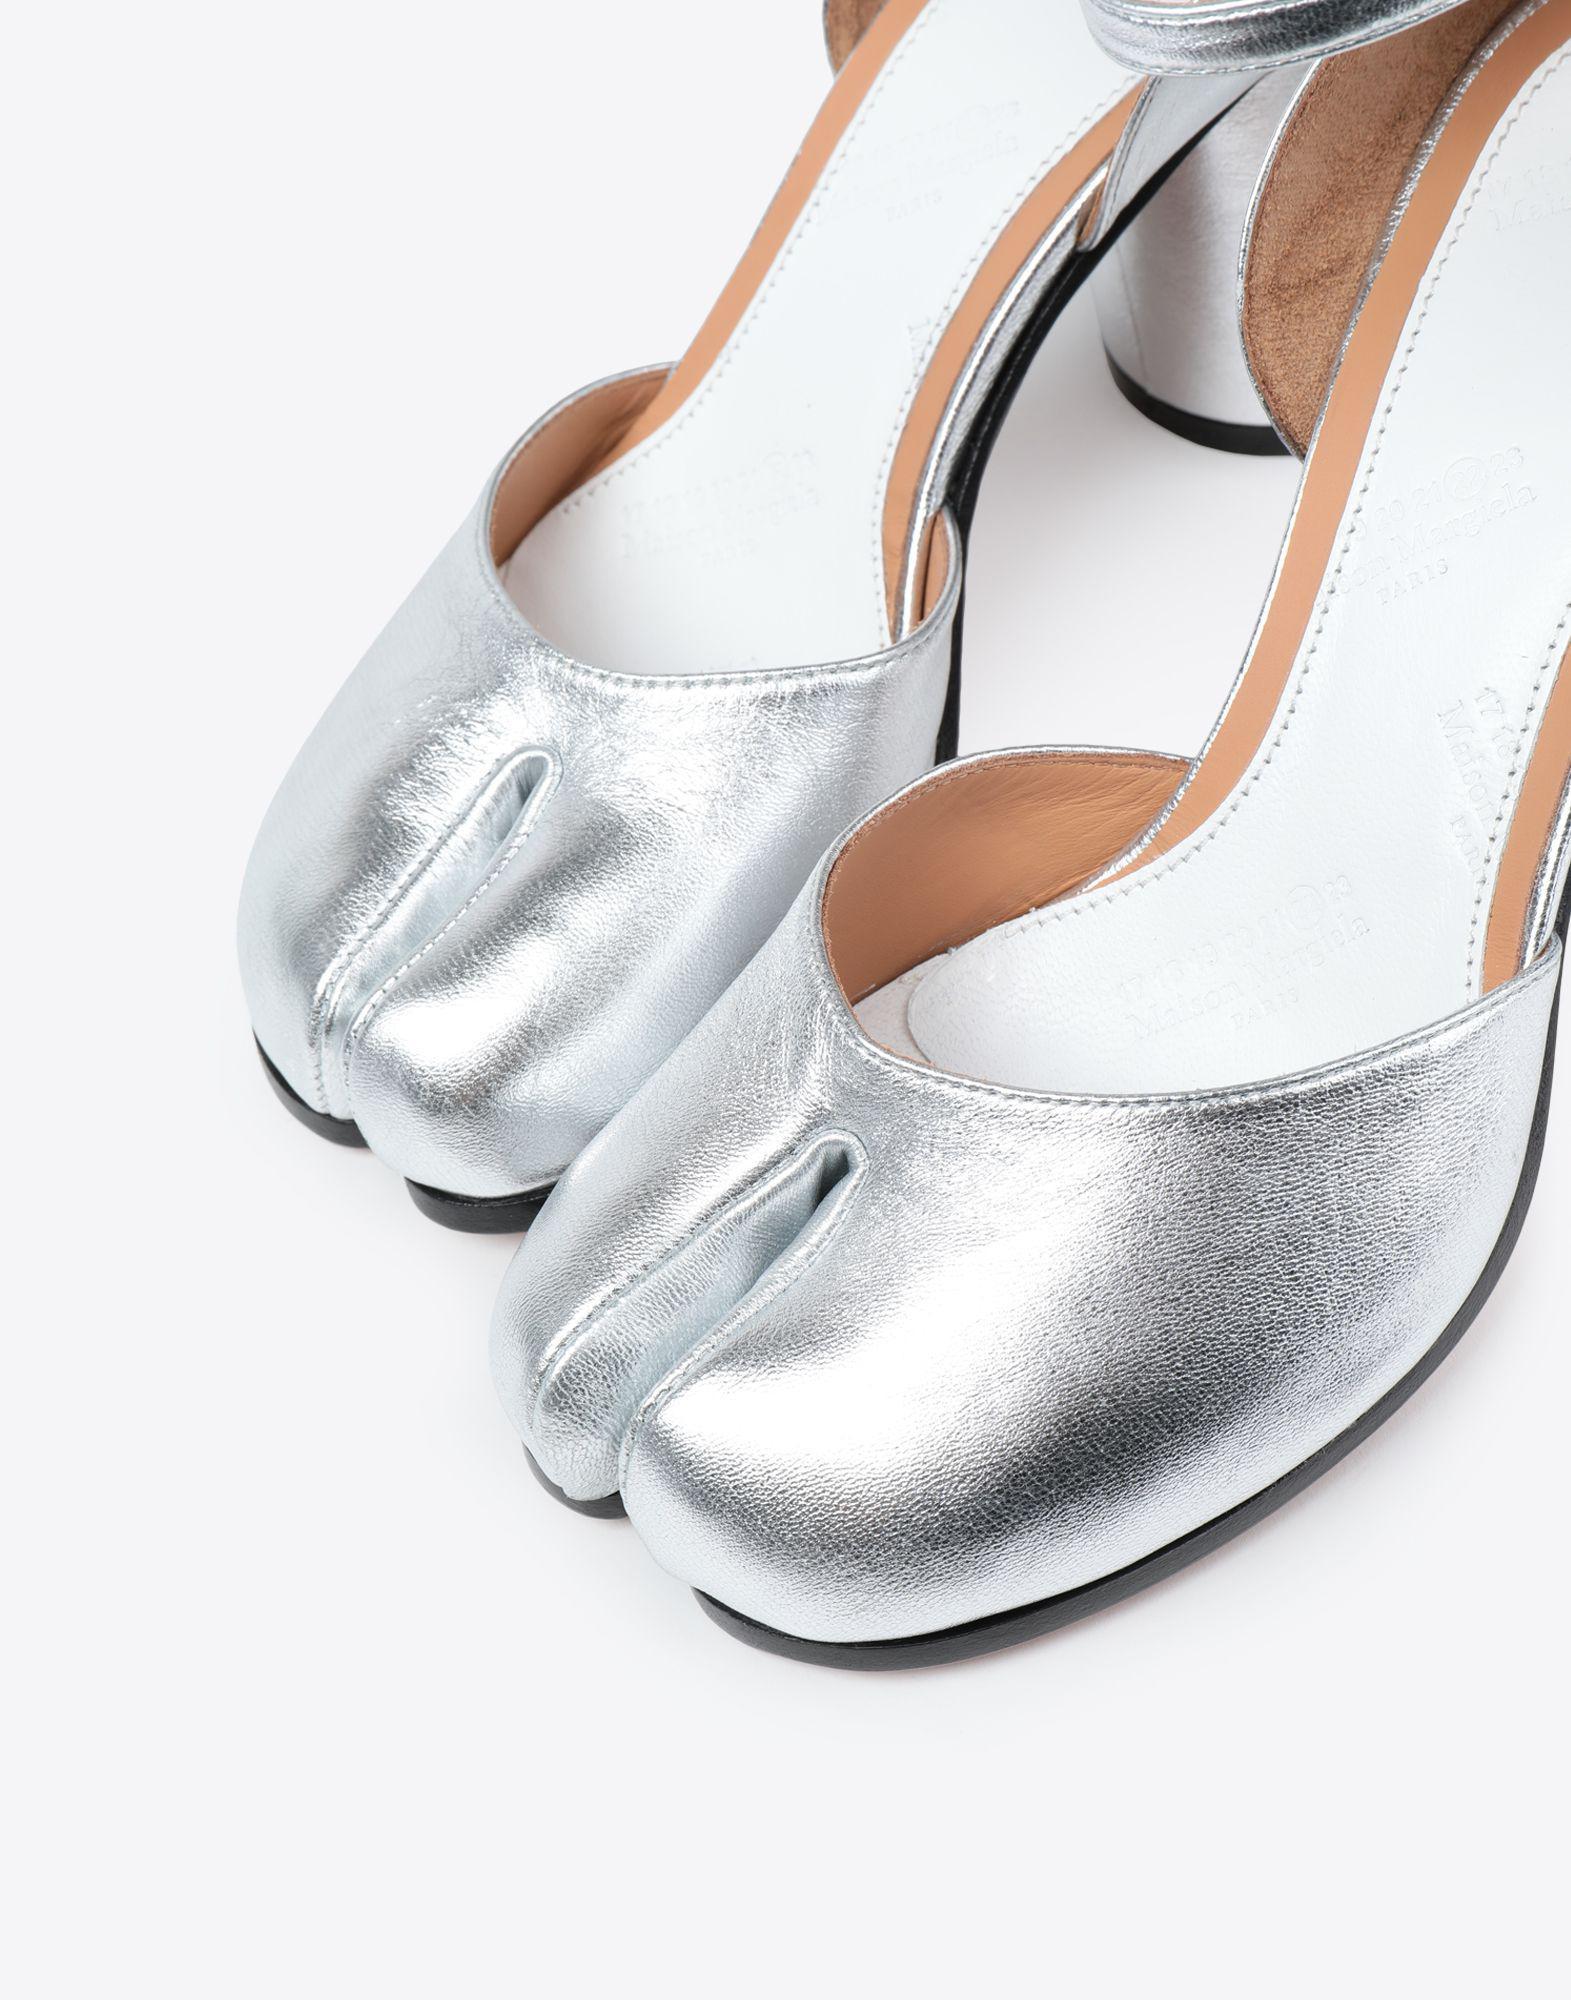 e6323981ca08 Lyst - Maison Margiela Silver Tabi Sandals in Metallic - Save 49%